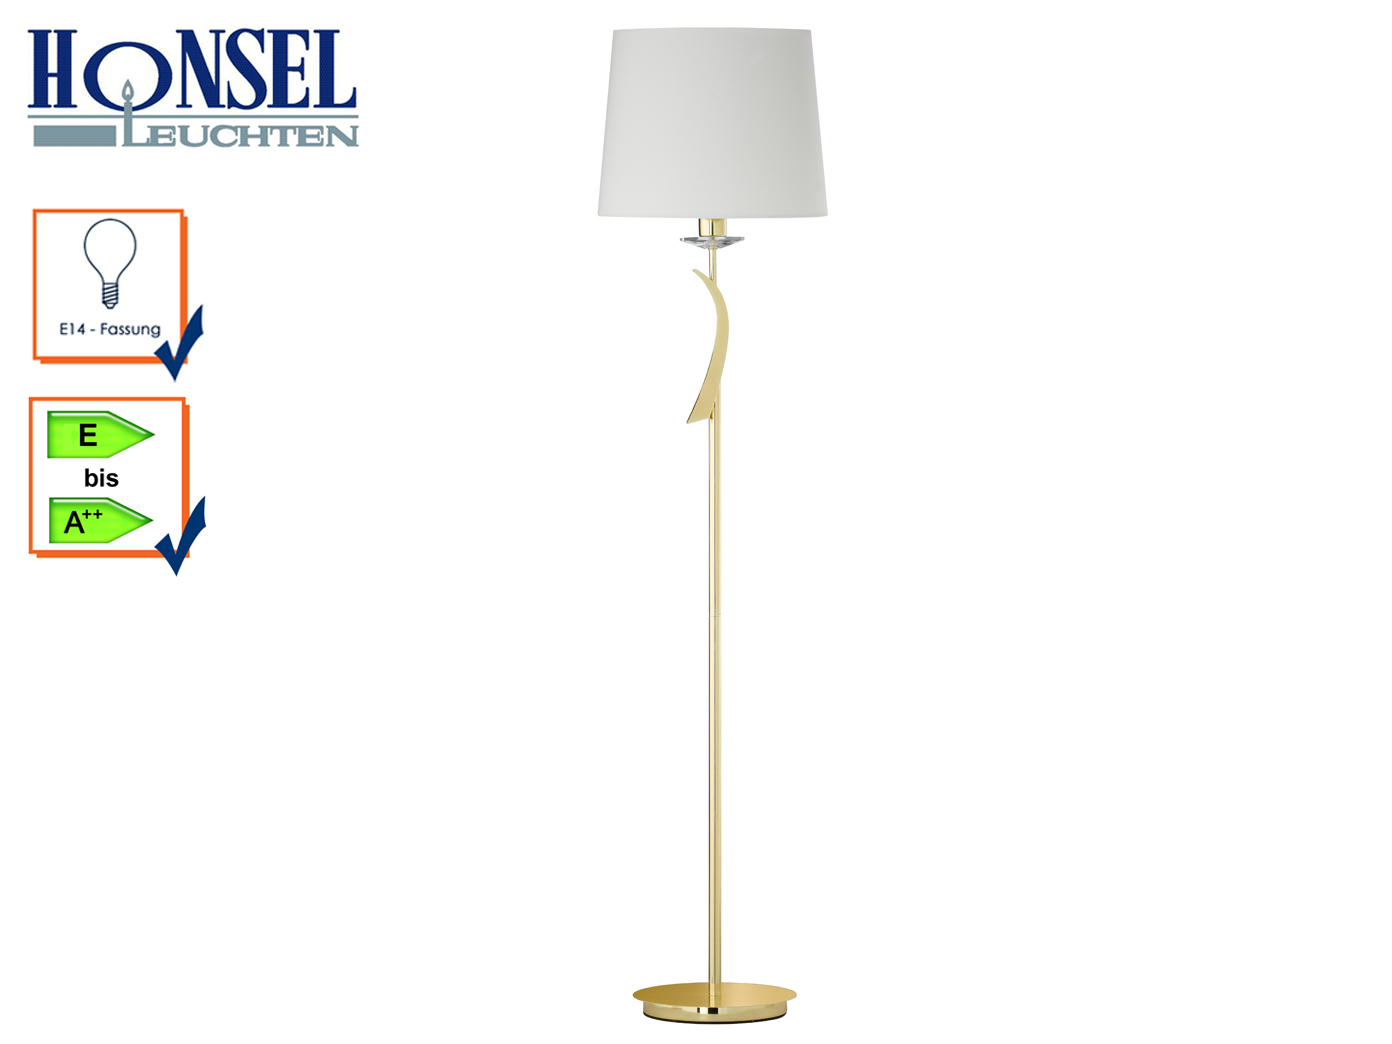 Standlampe Messing Poiert Stoffschirm Weiss H 150cm Schlafzimmer Flur